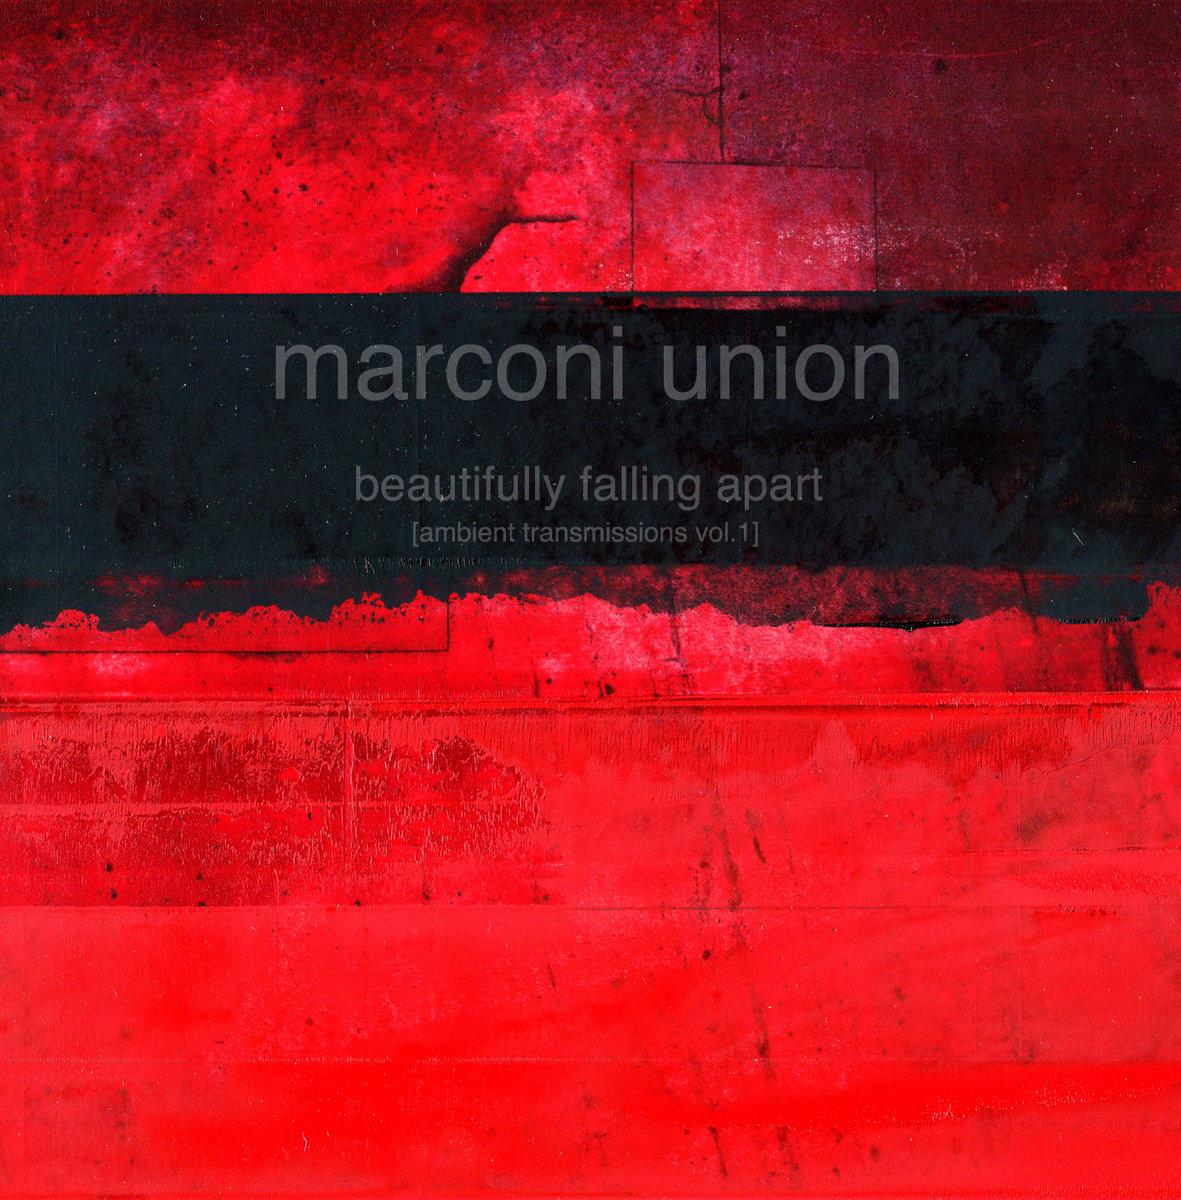 marconi union torrent